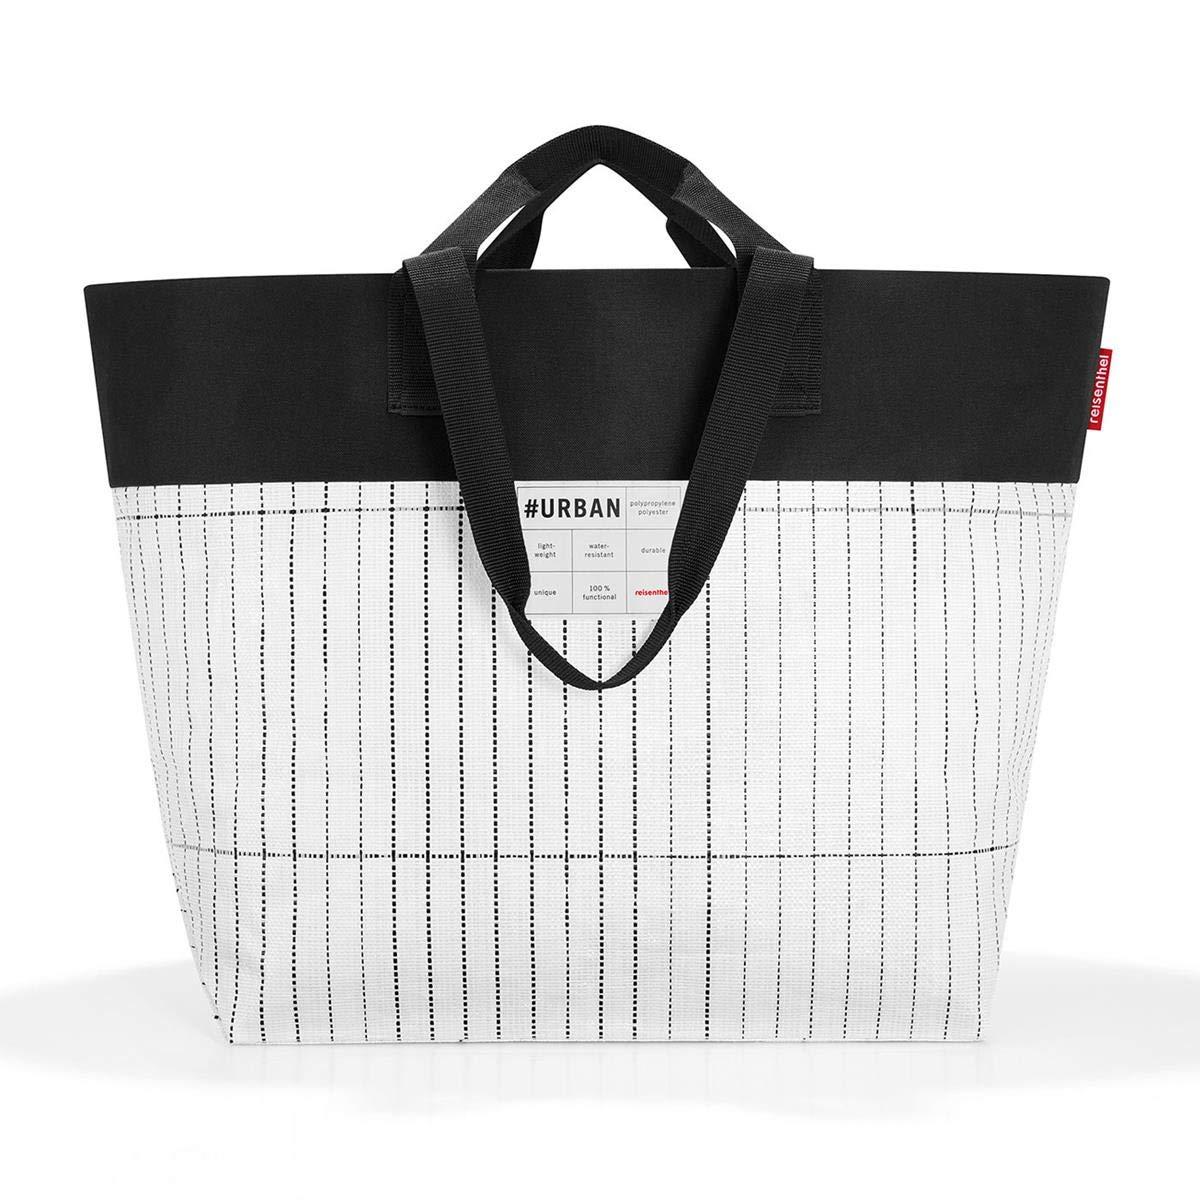 Reisenthel Shopping Urbain Sac Tokyo/Shopper 68 cm 50 liters Multicolore (Black White) PO7049